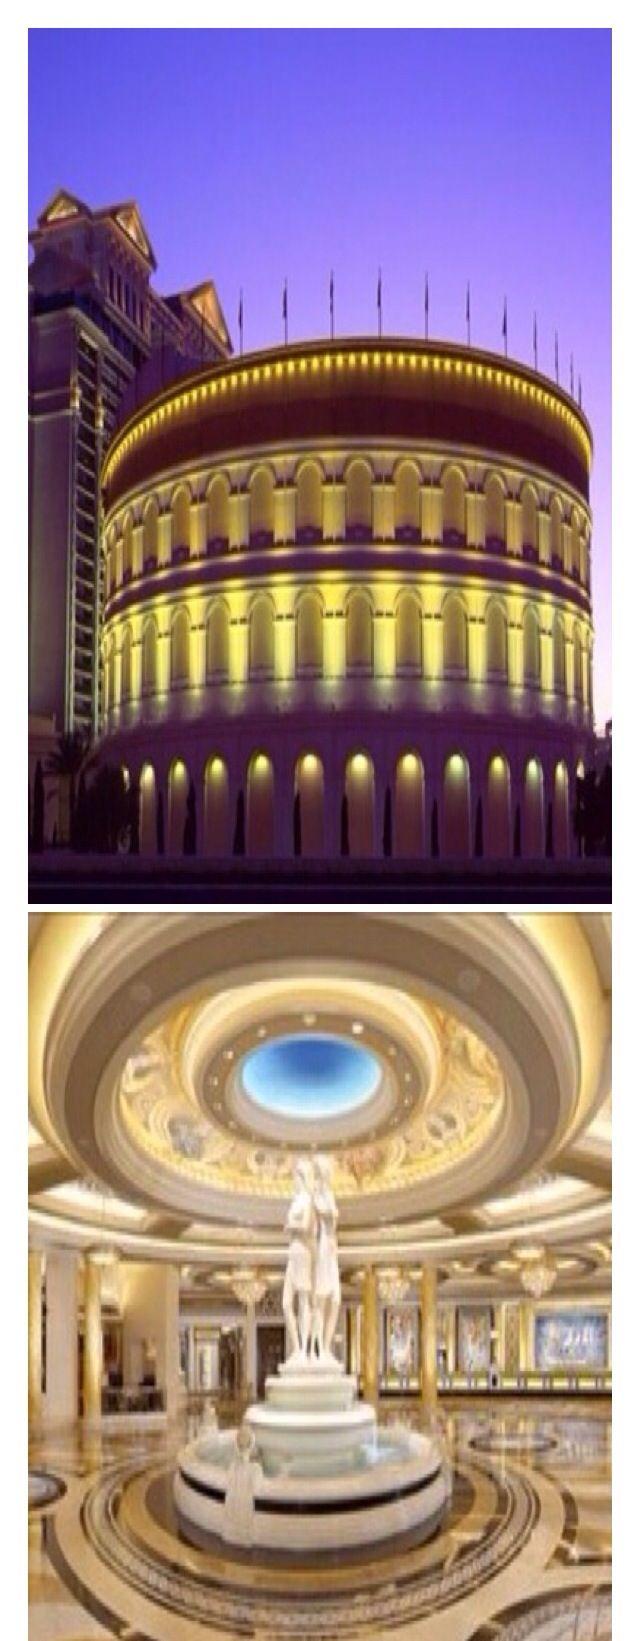 Ameristar Casino Hotel and Spa in Black Hawk